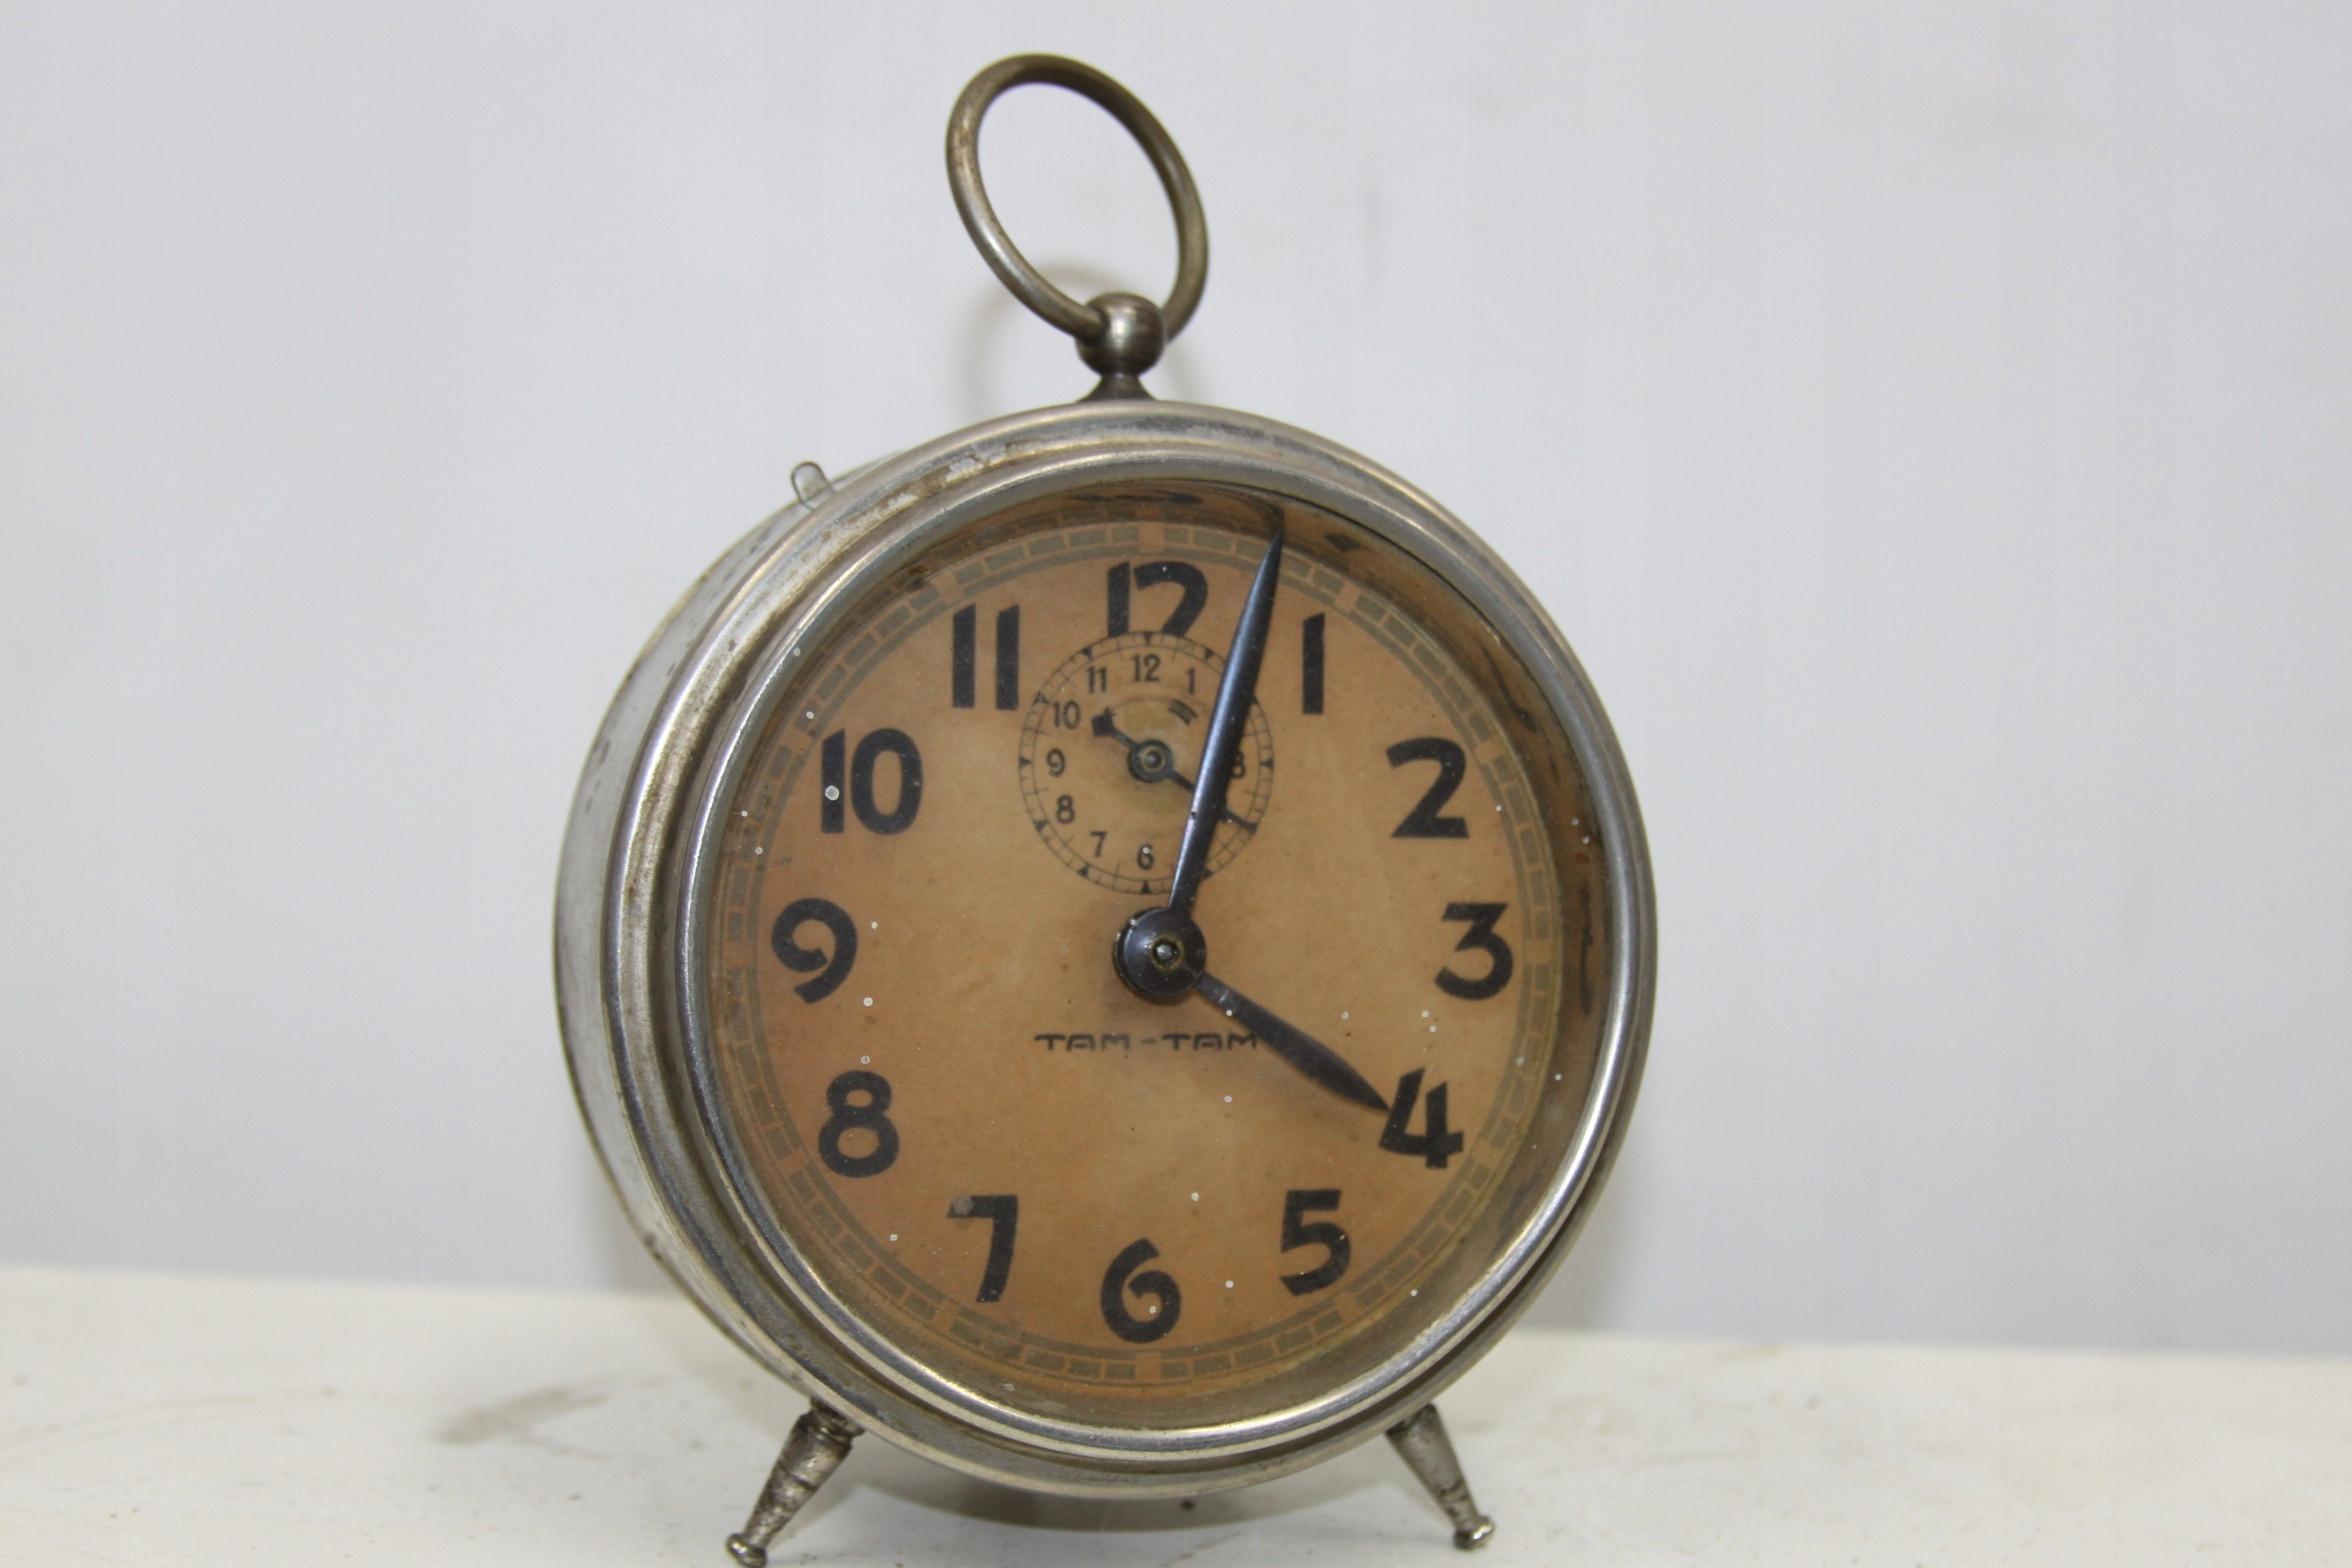 zegarek budzik Tam-Tam